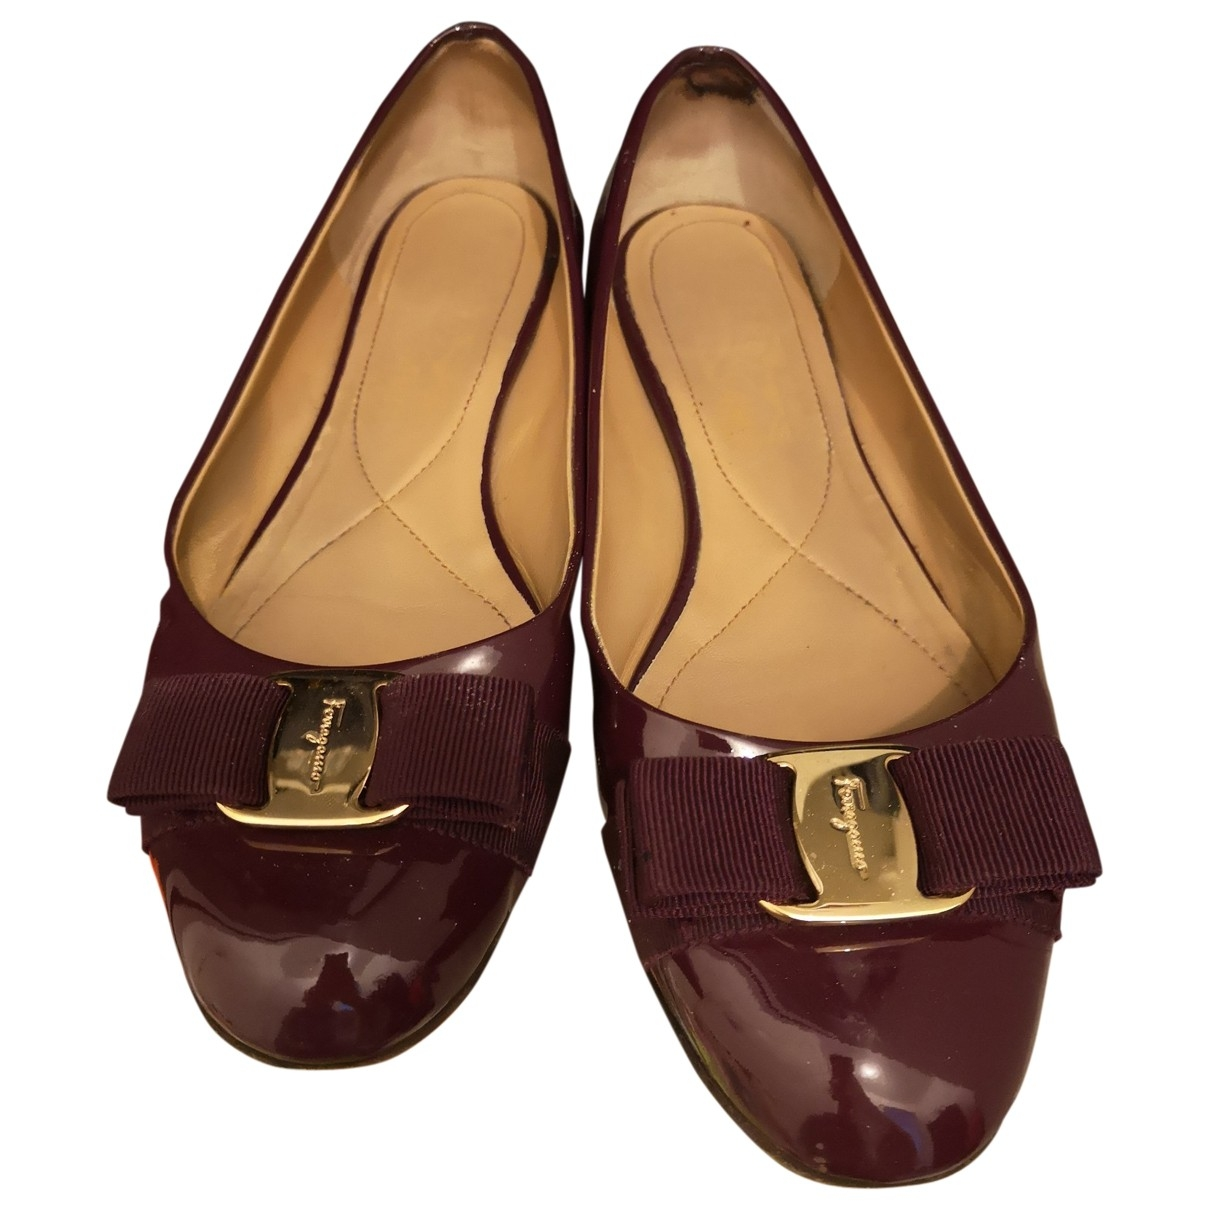 Salvatore Ferragamo \N Burgundy Patent leather Ballet flats for Women 7.5 UK